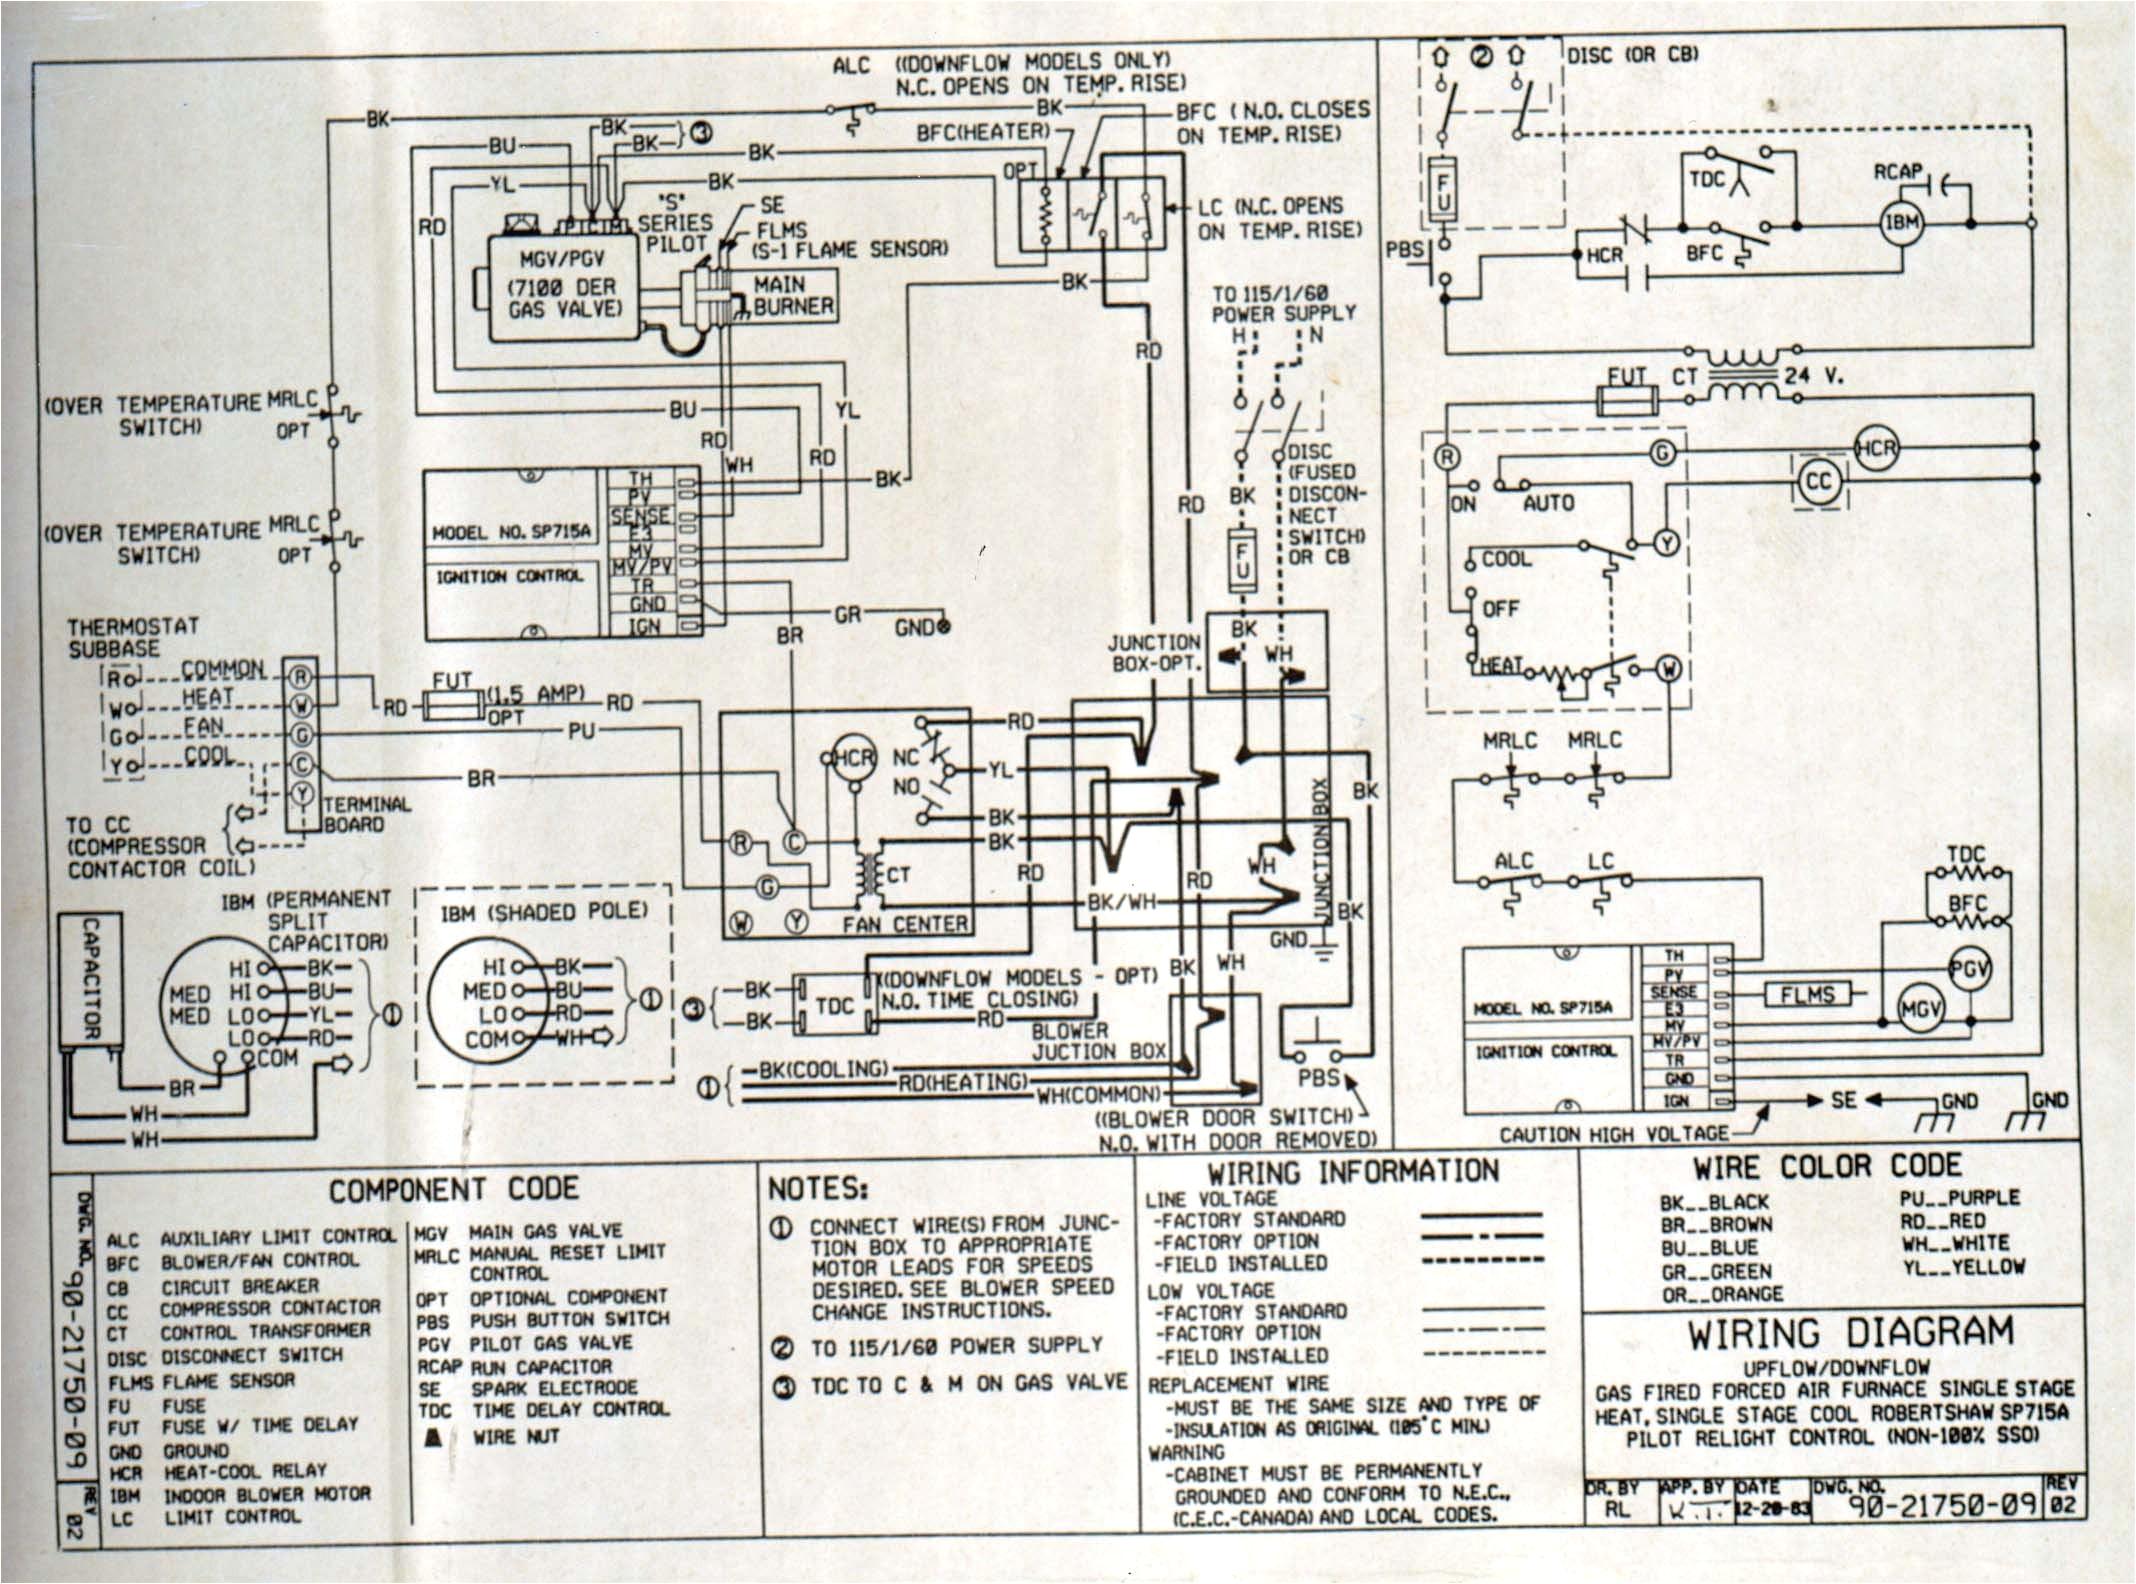 Whirlpool Dryer Wiring Diagram Whirlpool Dryer Wiring Diagram Lovely Whirlpool Electric Dryer